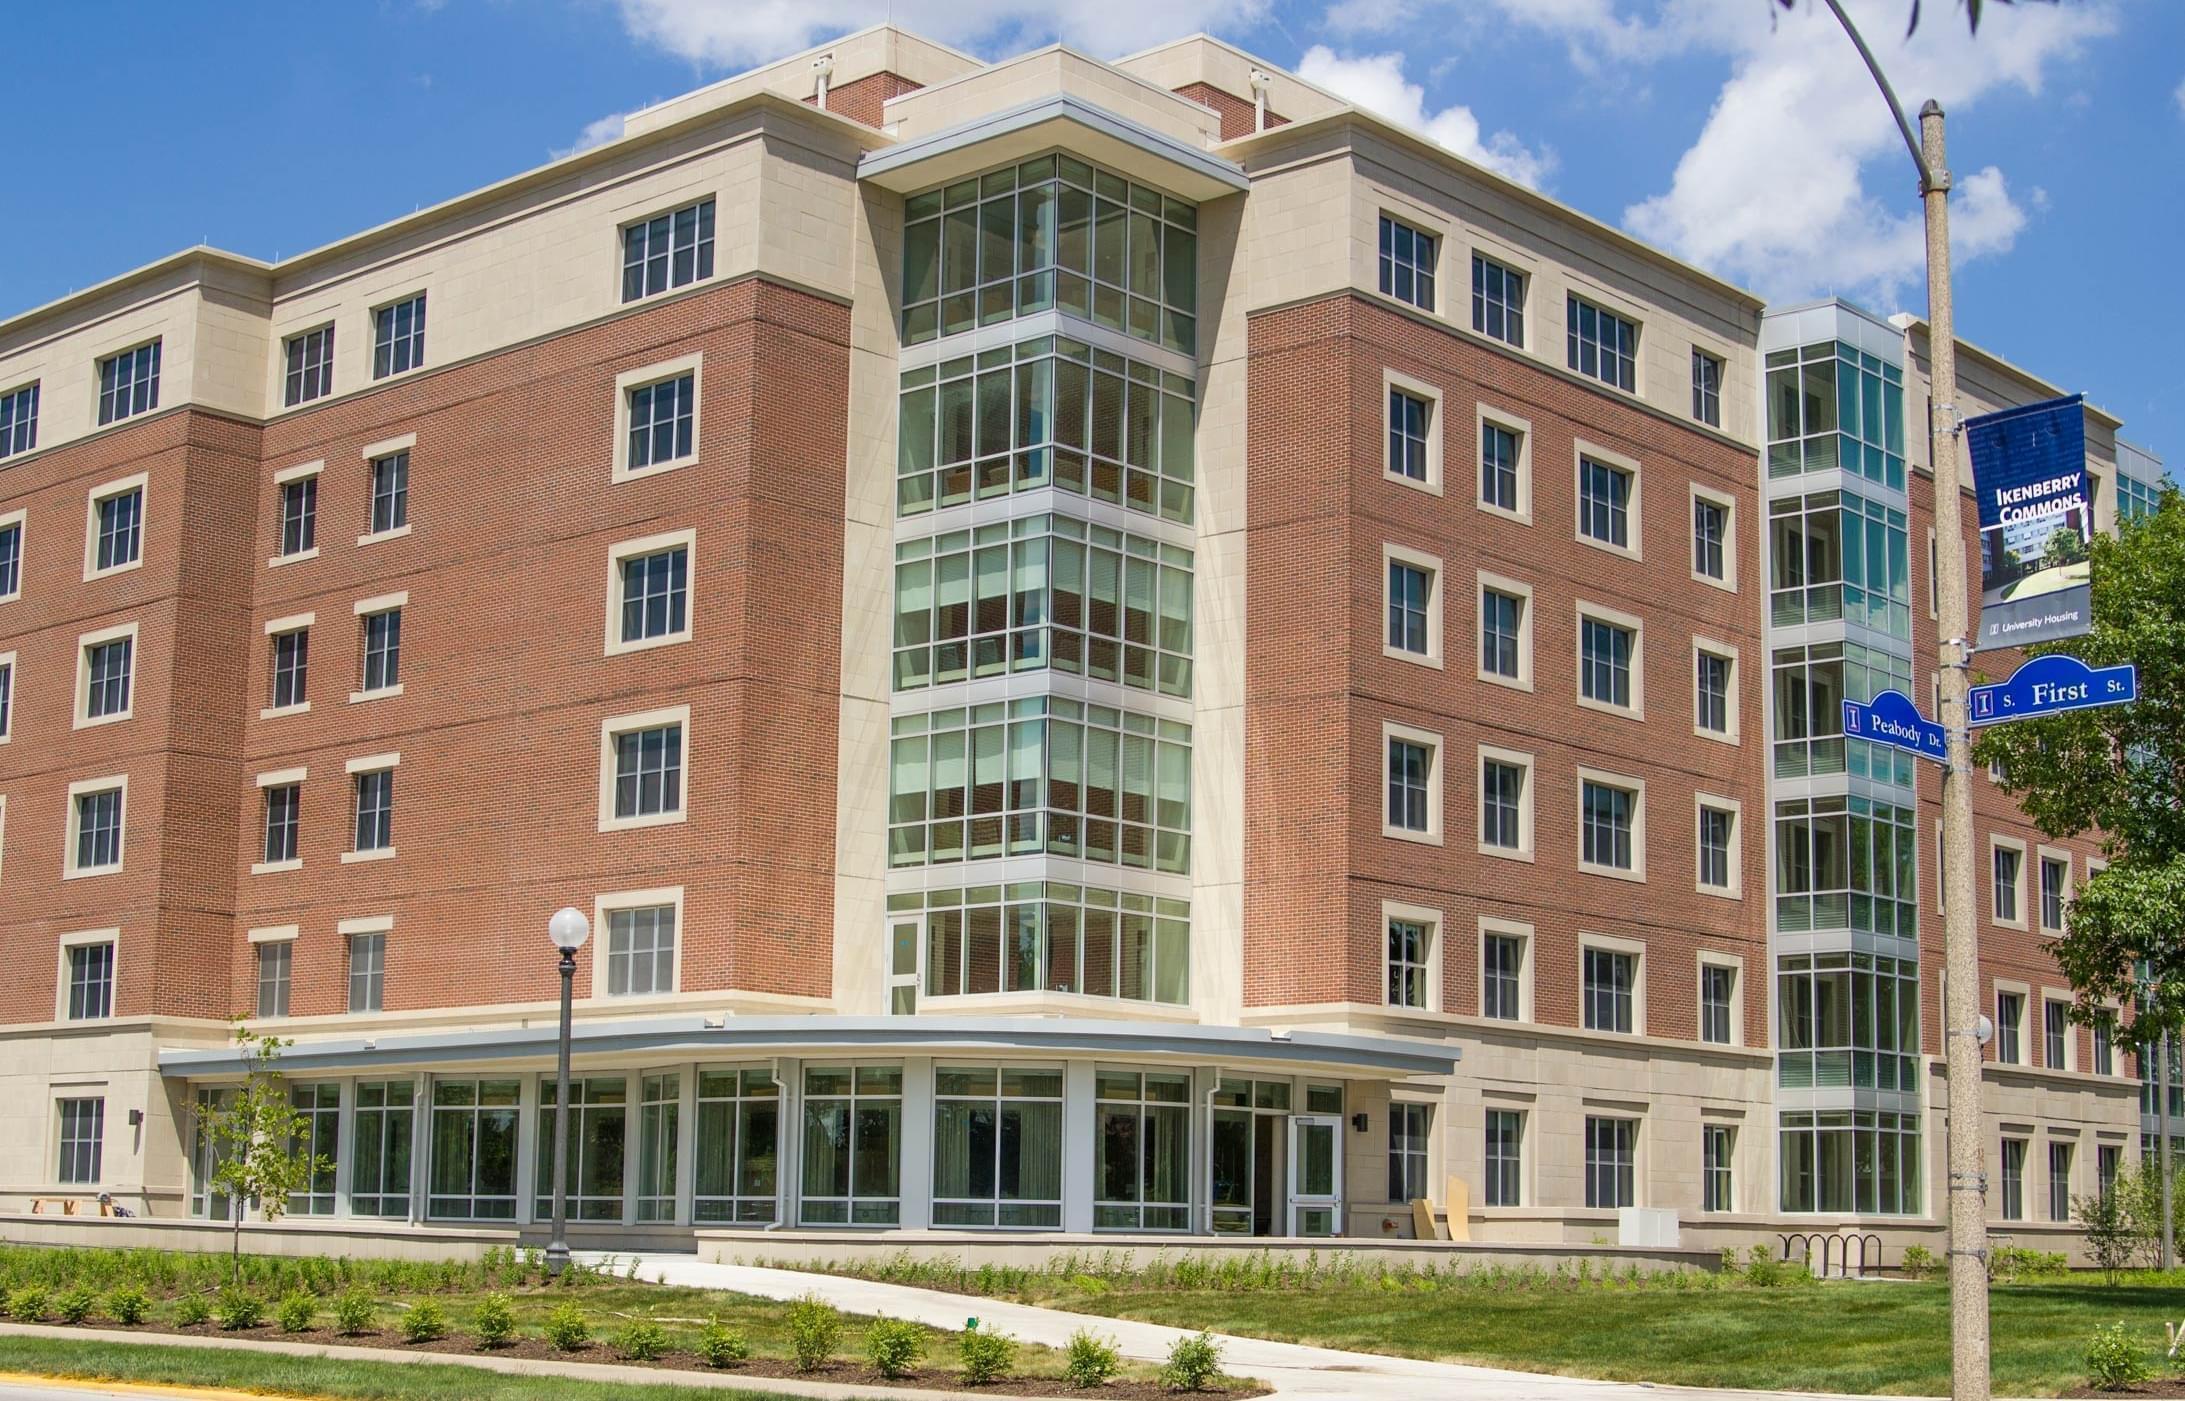 Bousfield Hall on the University of Illinois' Urbana campus.